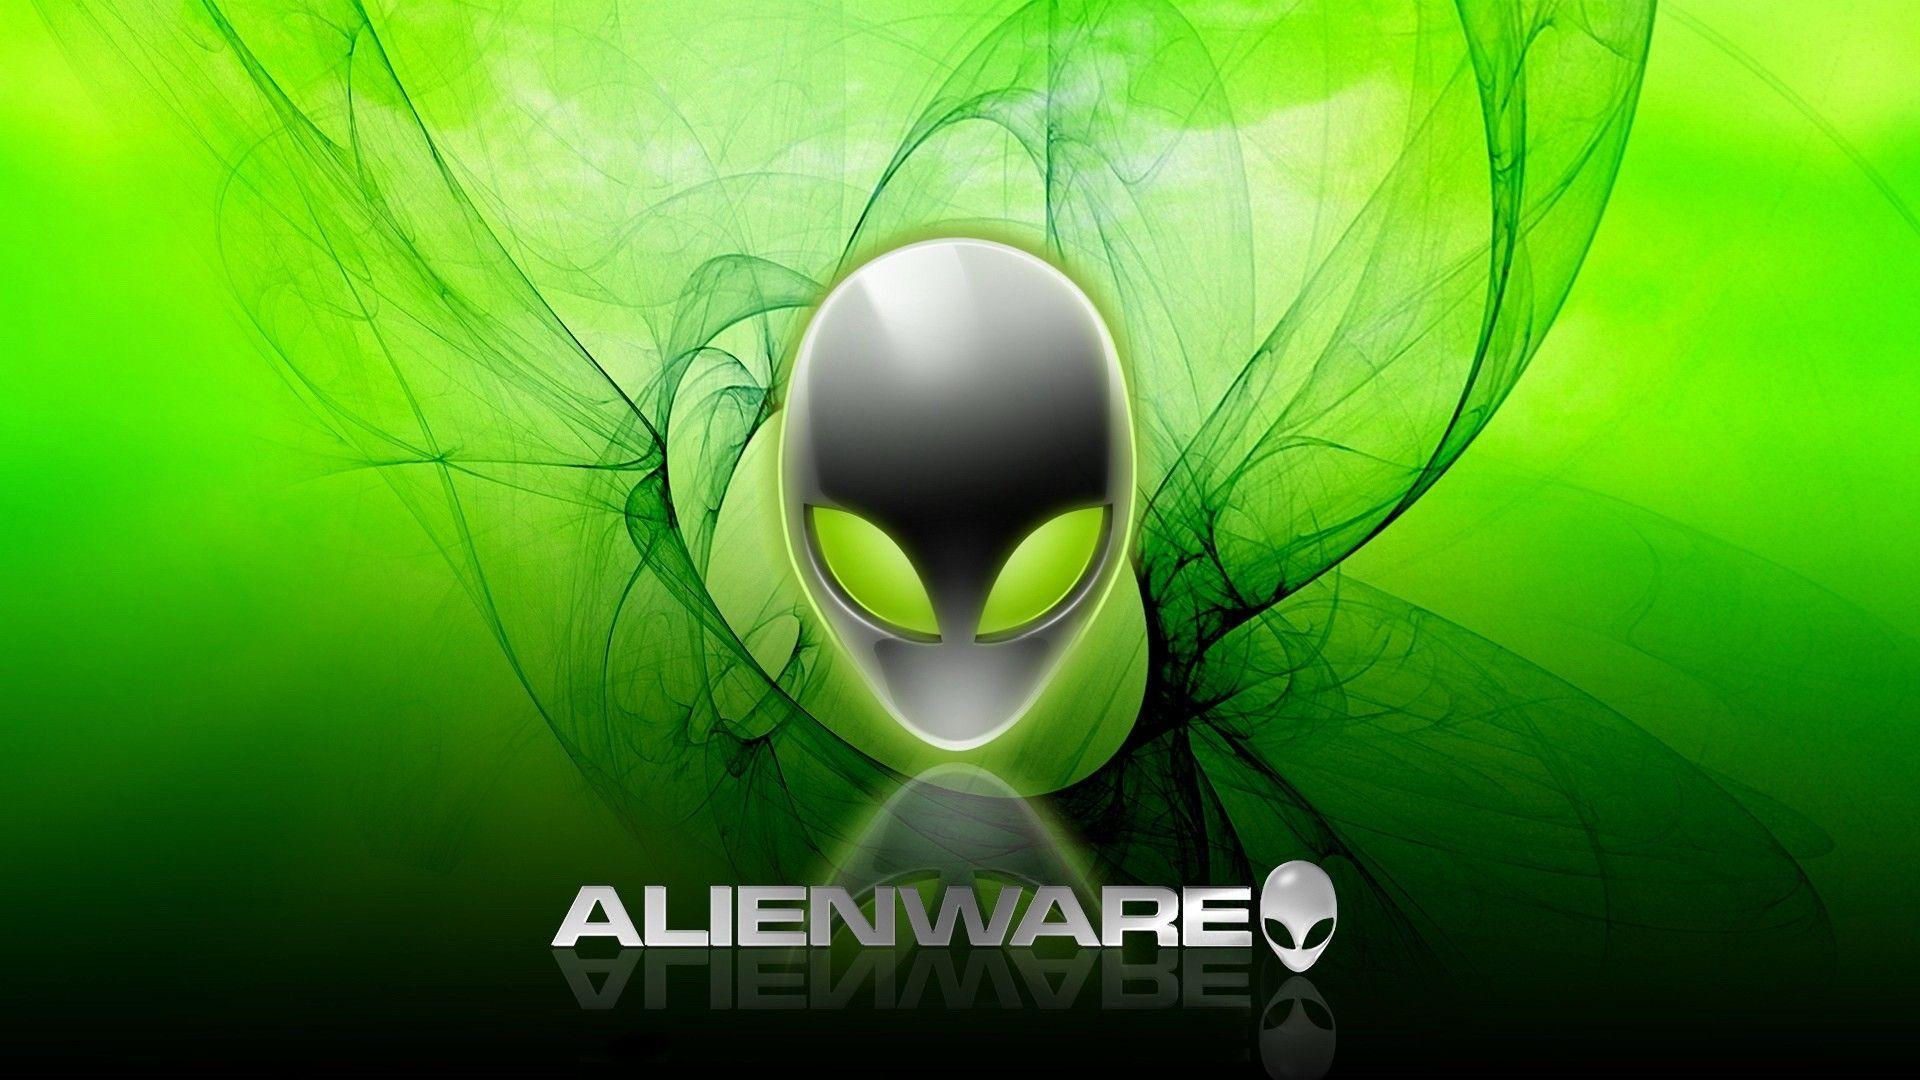 alienware wallpaper green hd - photo #8